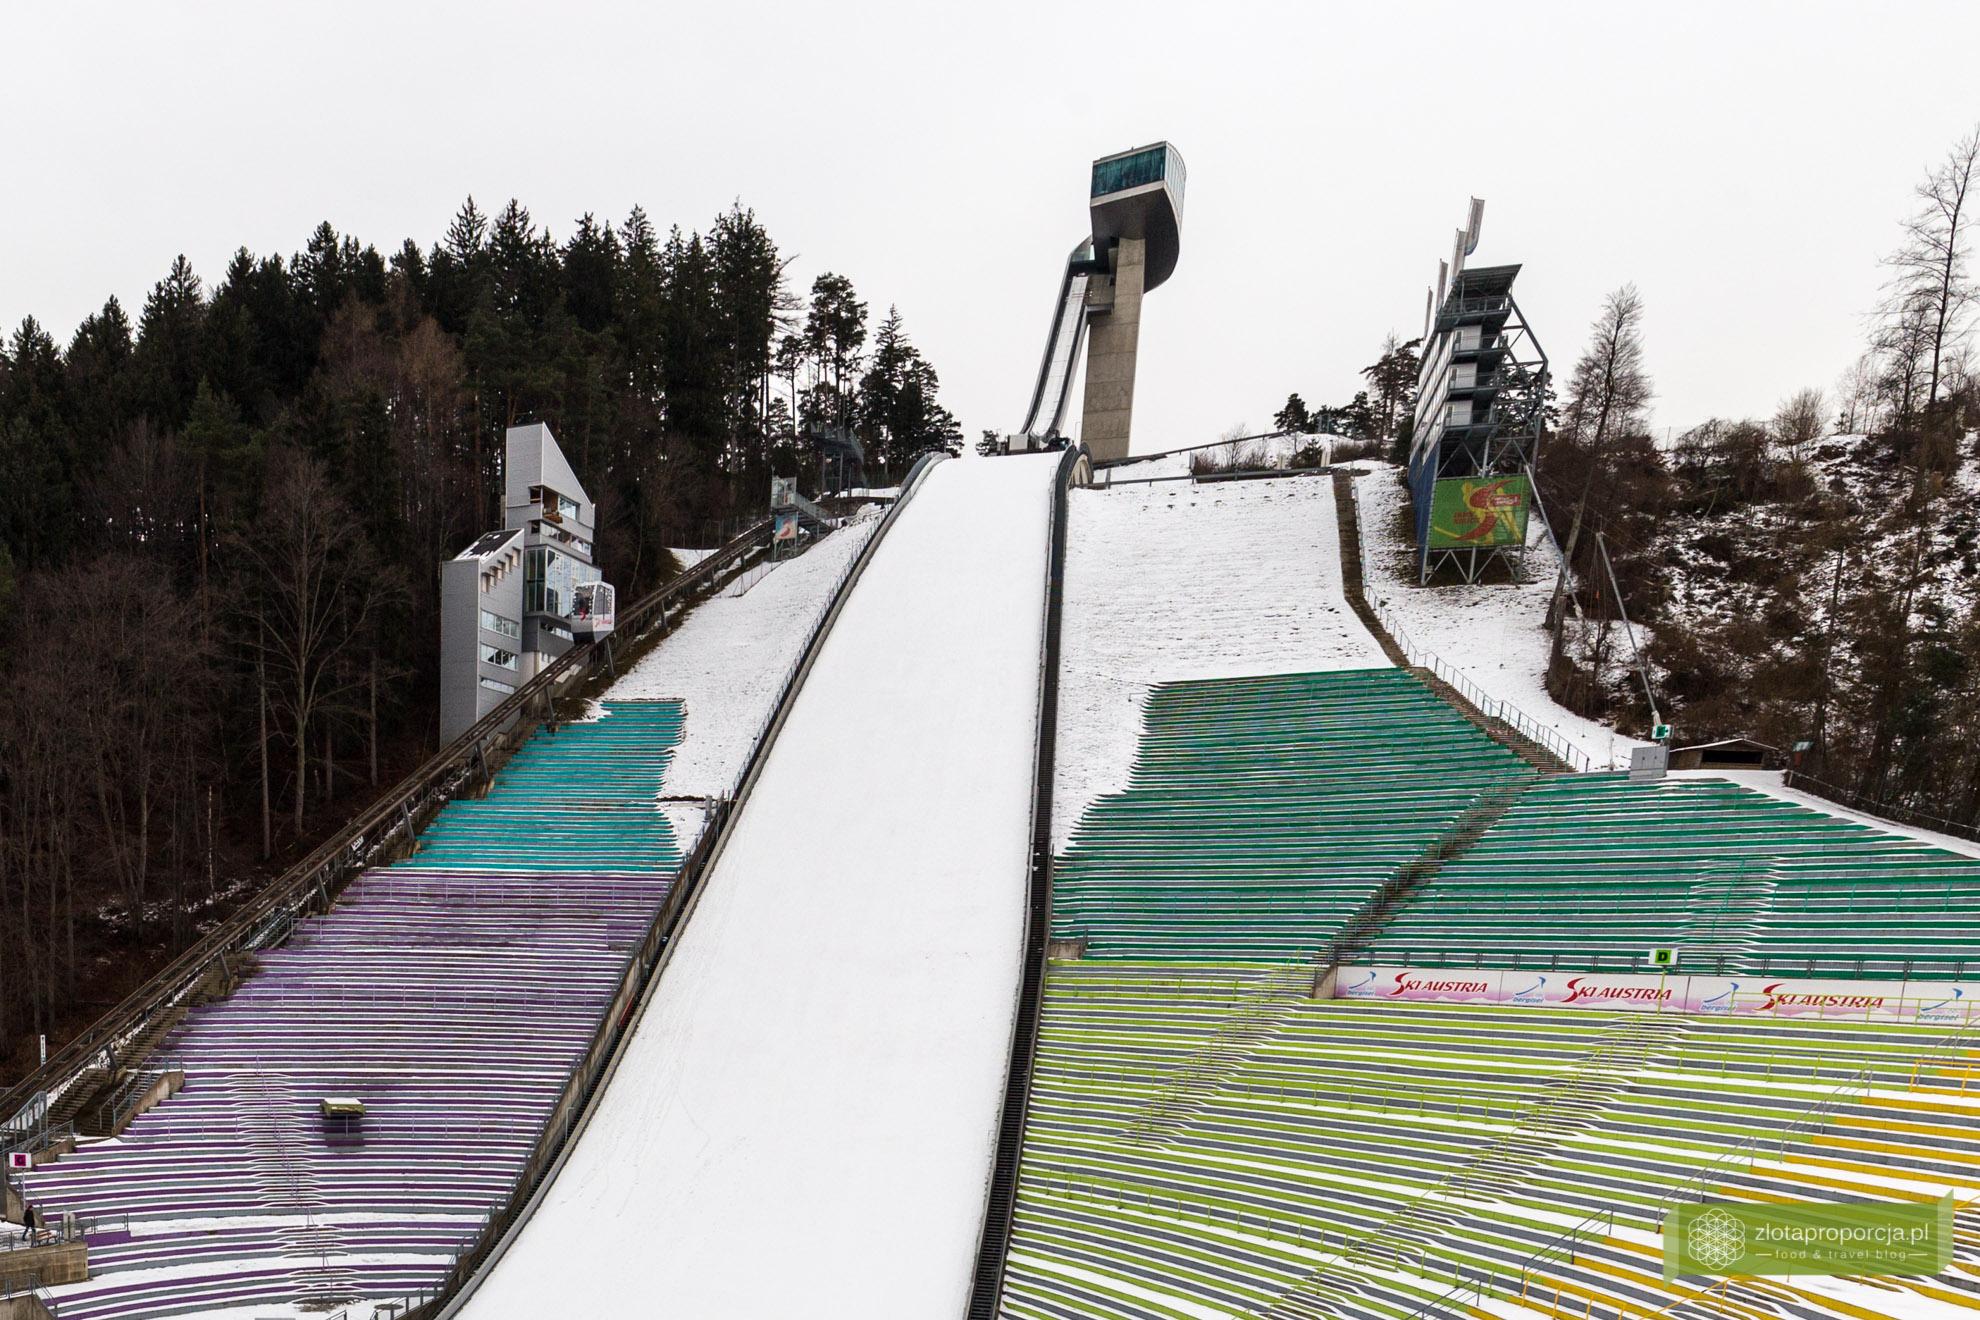 Innsbruck, Tyrol, Austria, atrakcje Innsbrucka, skocznia Bergisel, skocznia narciarska w Innsbrucku